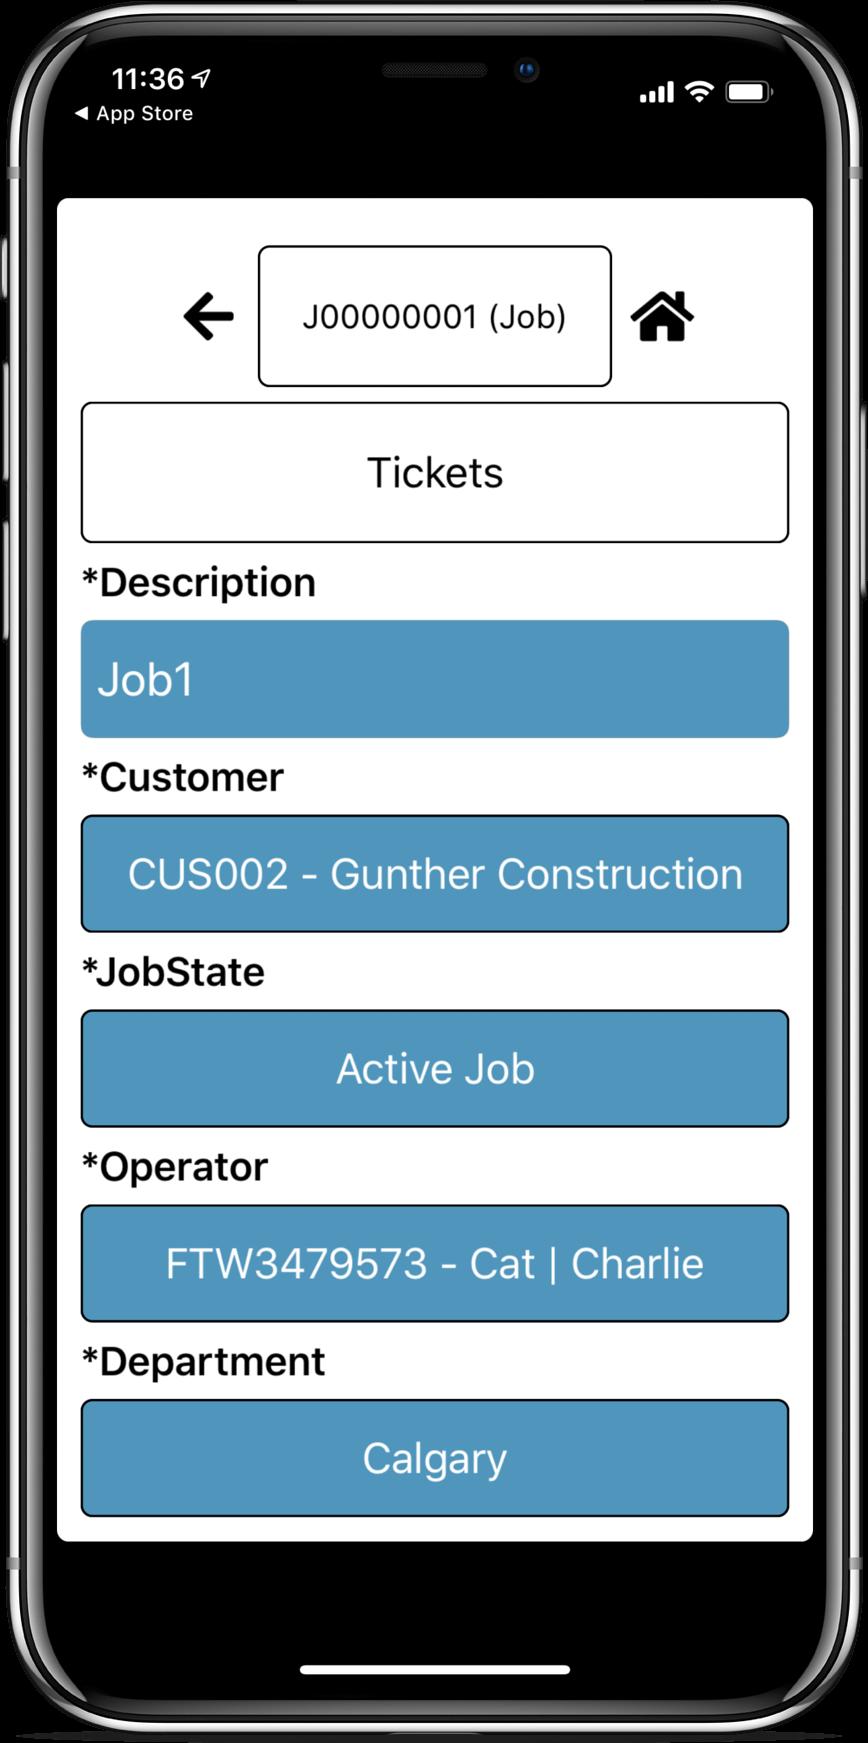 Spira ORP screenshot: Spira FI mobile